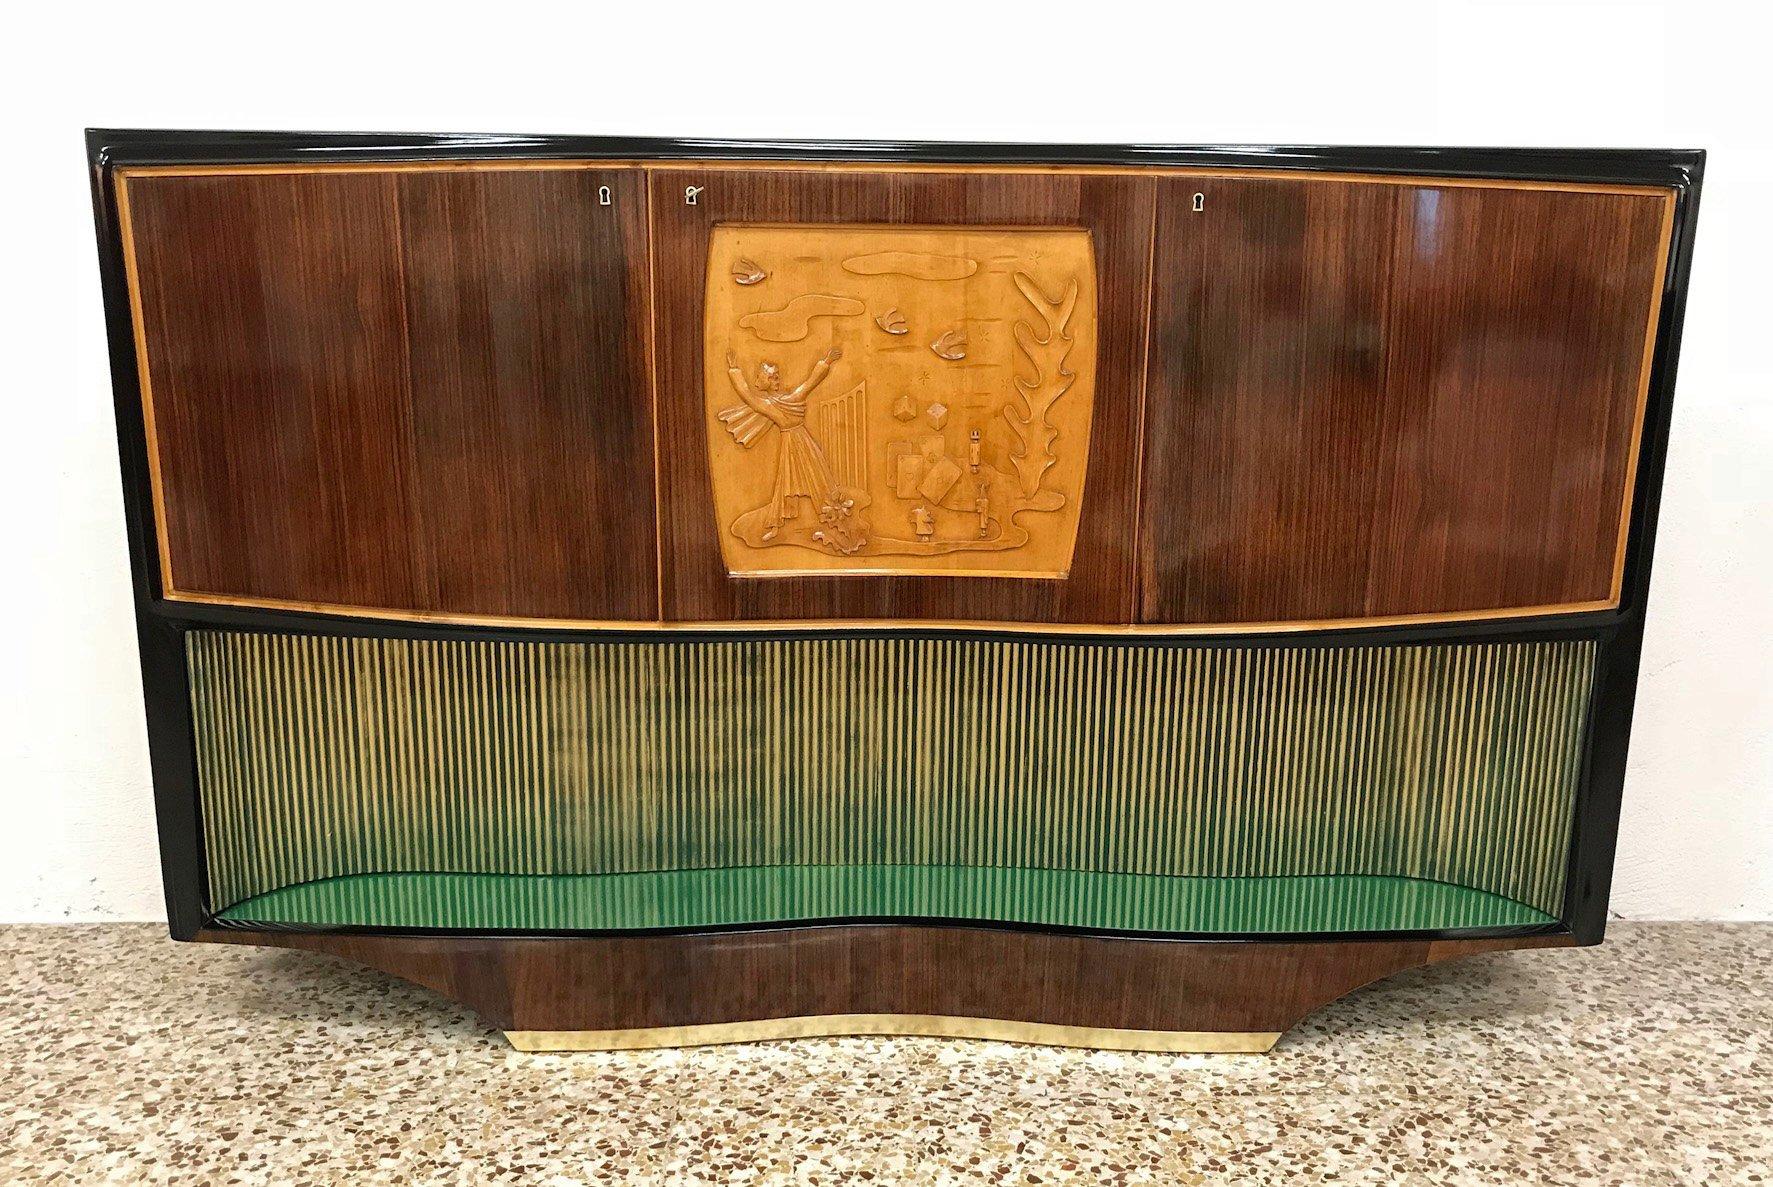 cabinet mid nagpurentrepreneurs bar fold tall imanisrcom teak out century galery danish